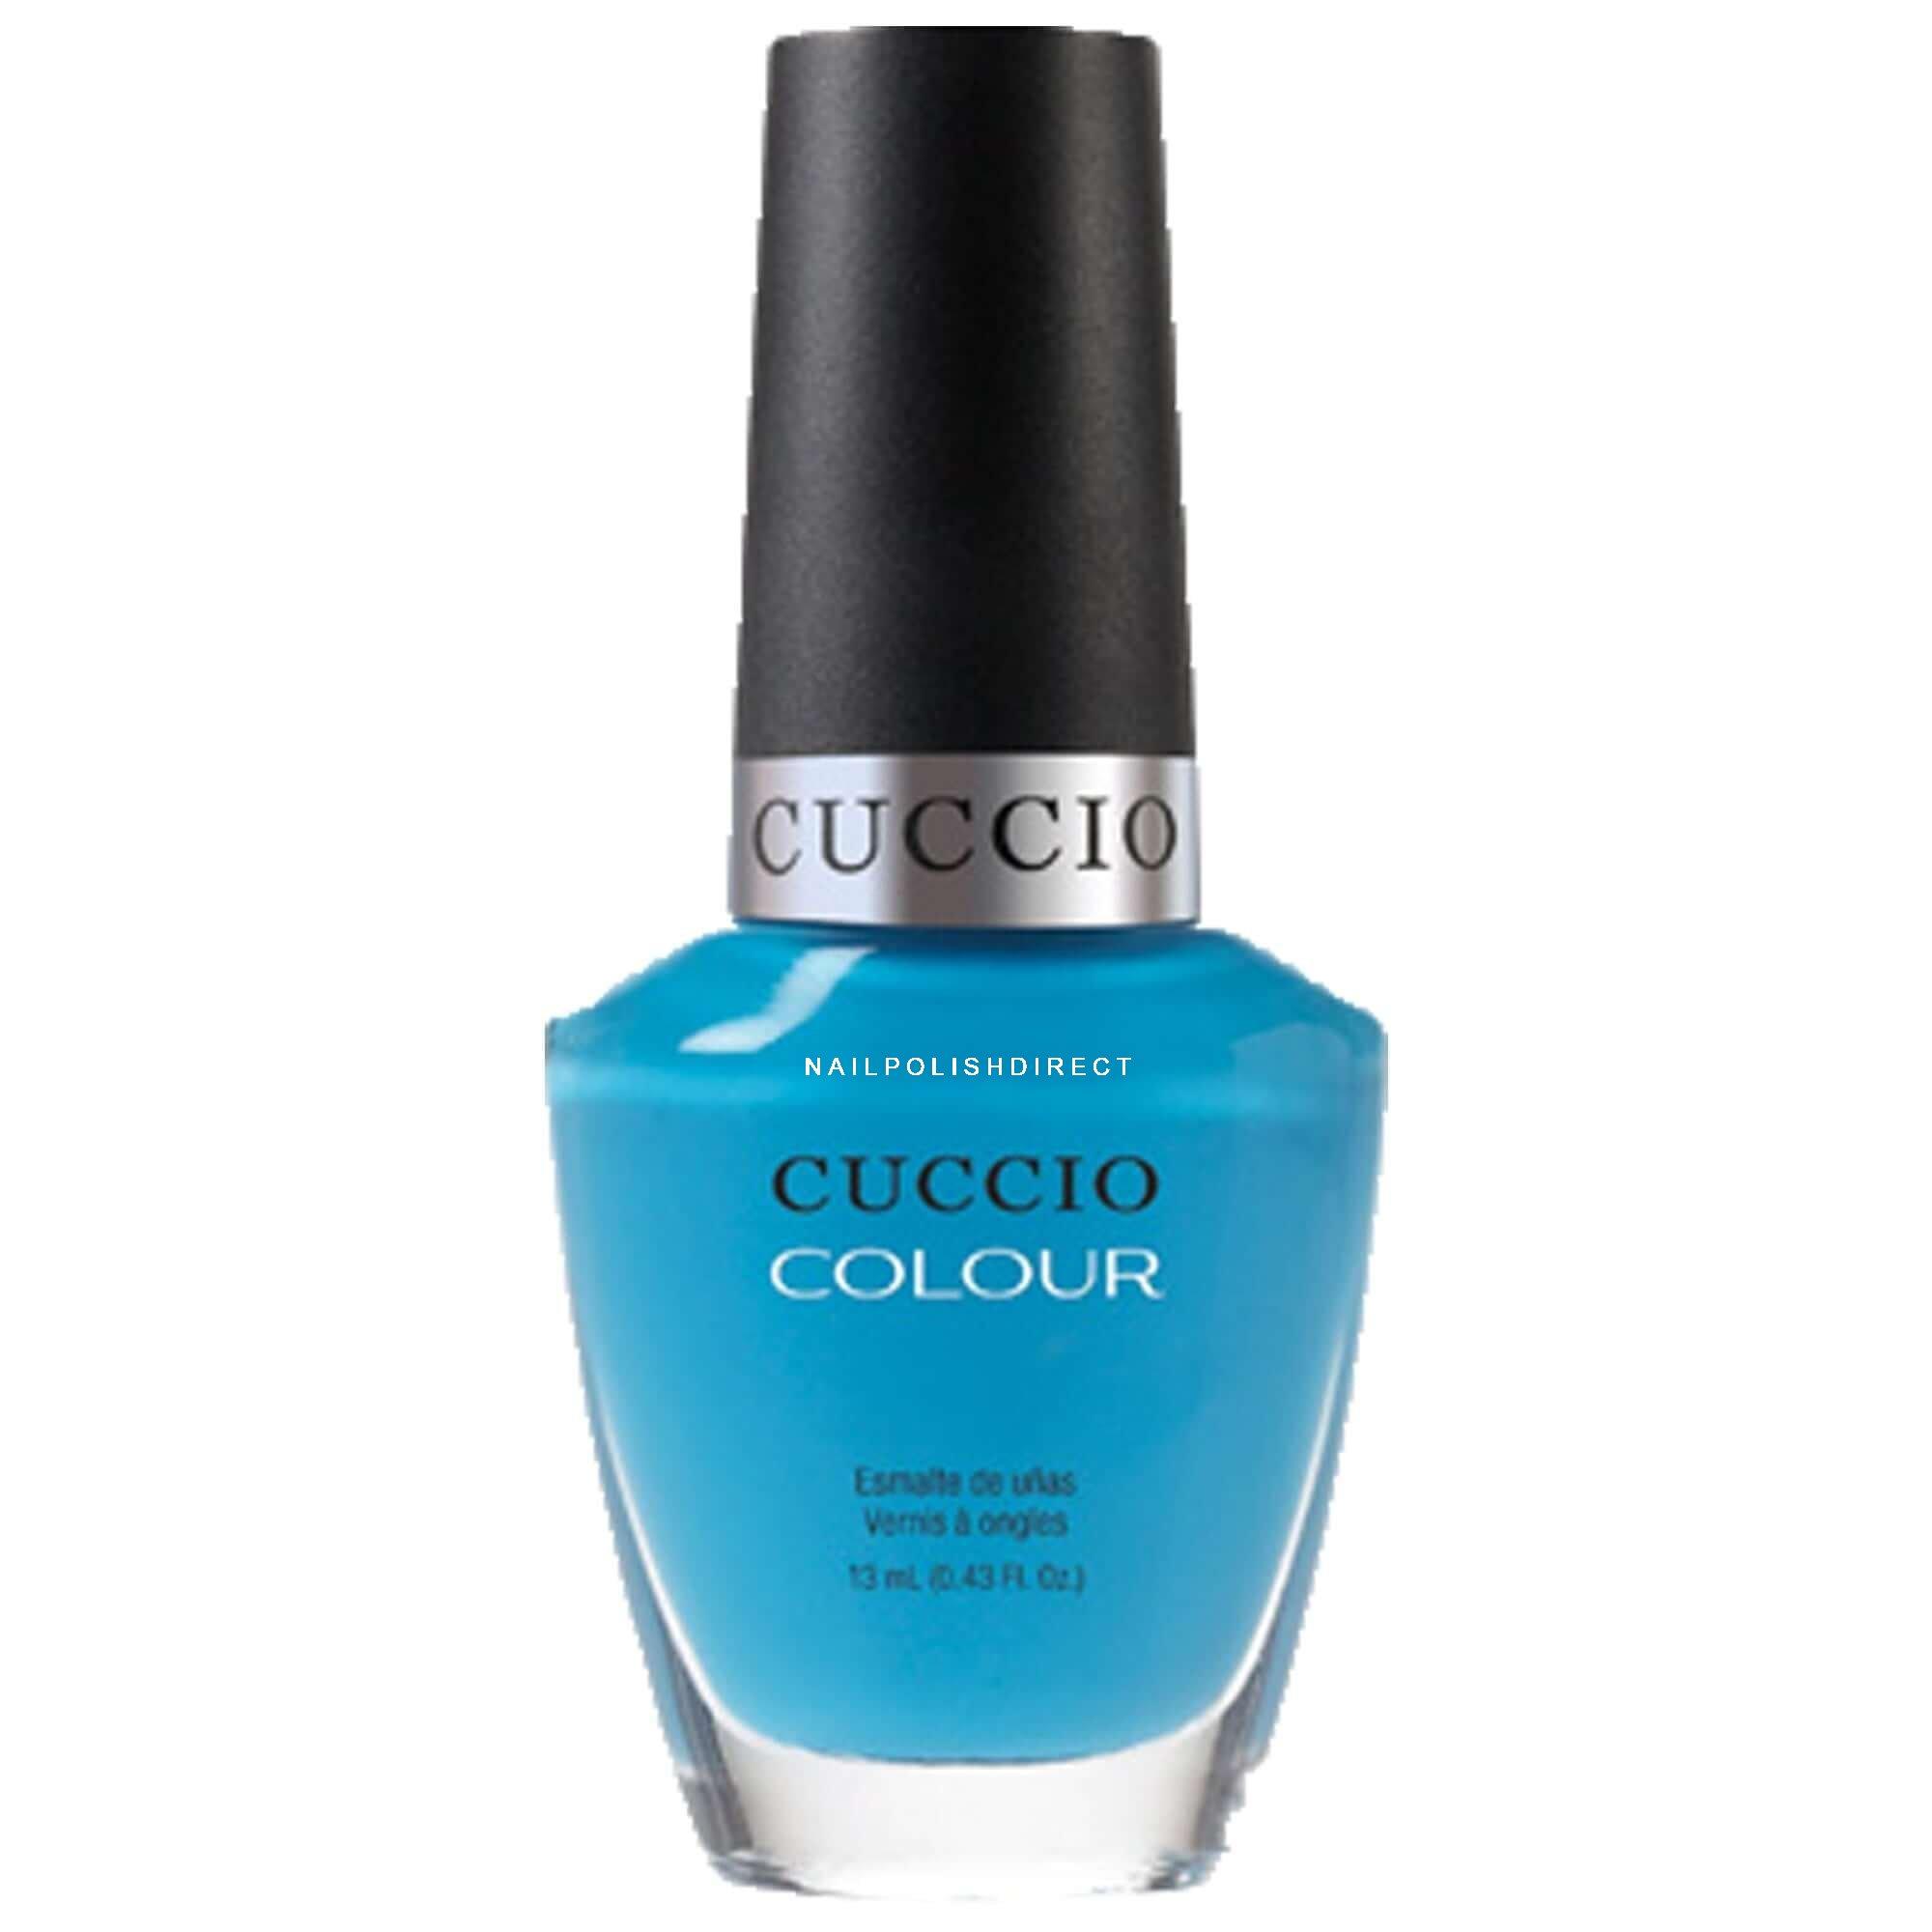 Cuccio St Barts in a Bottle Colour Nail Polish 13ml